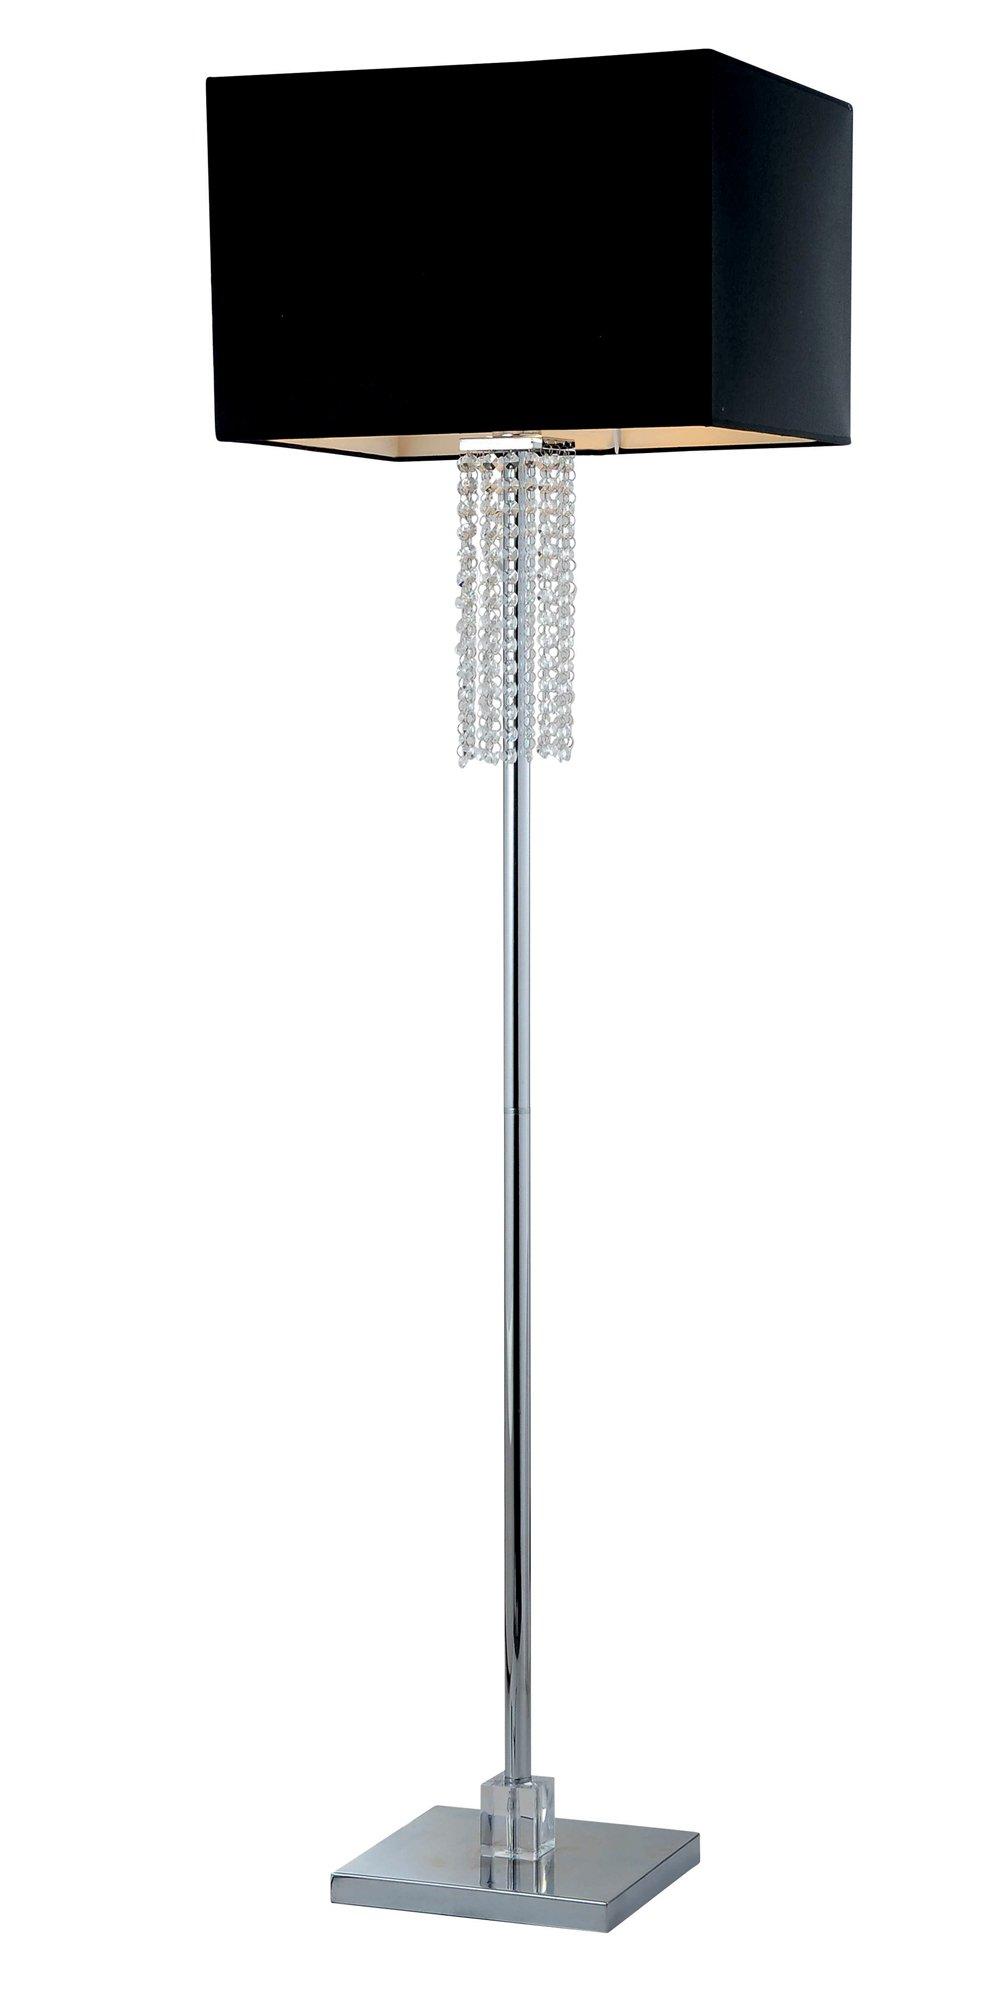 Artiva USA A501101 Adelyn Square Modern Crystal Floor Lamp, 63'', Chrome/Black by Artiva USA